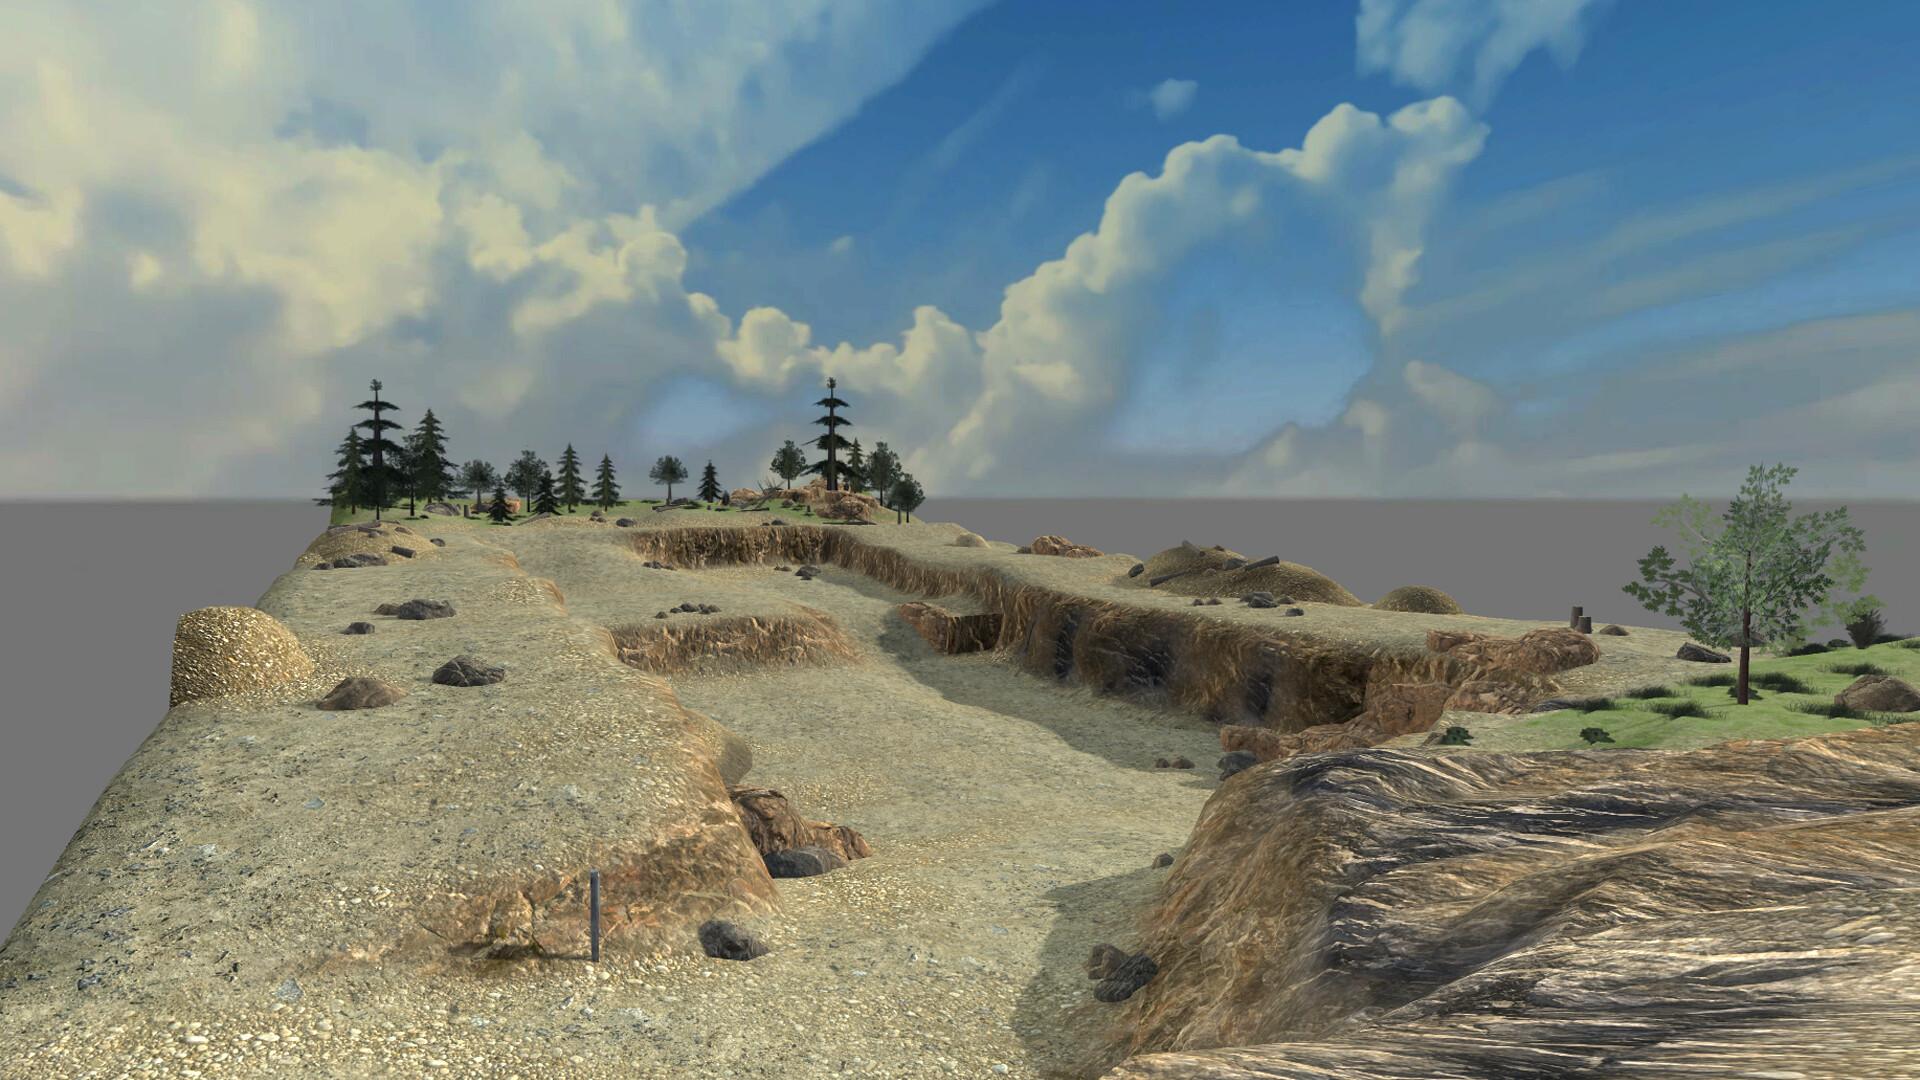 Jordan cameron quarry 18